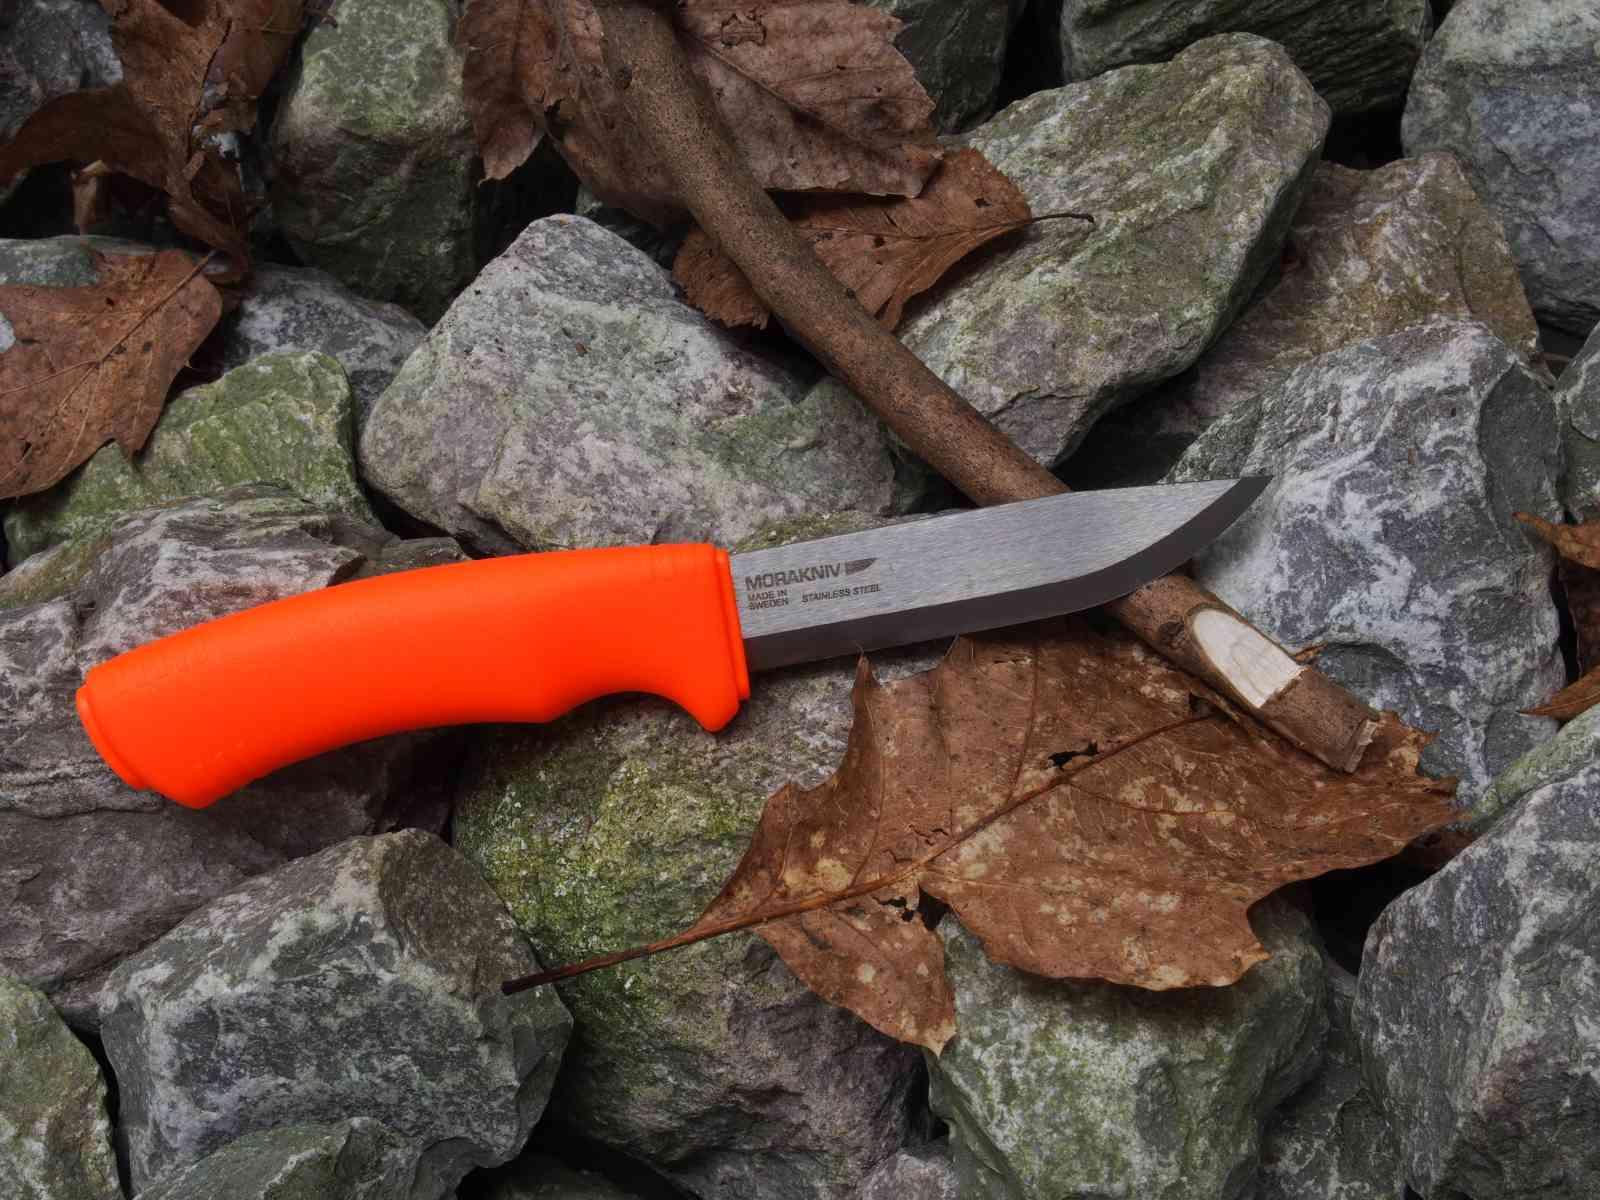 Mora Bushcraft Survival - Holzarbeiten